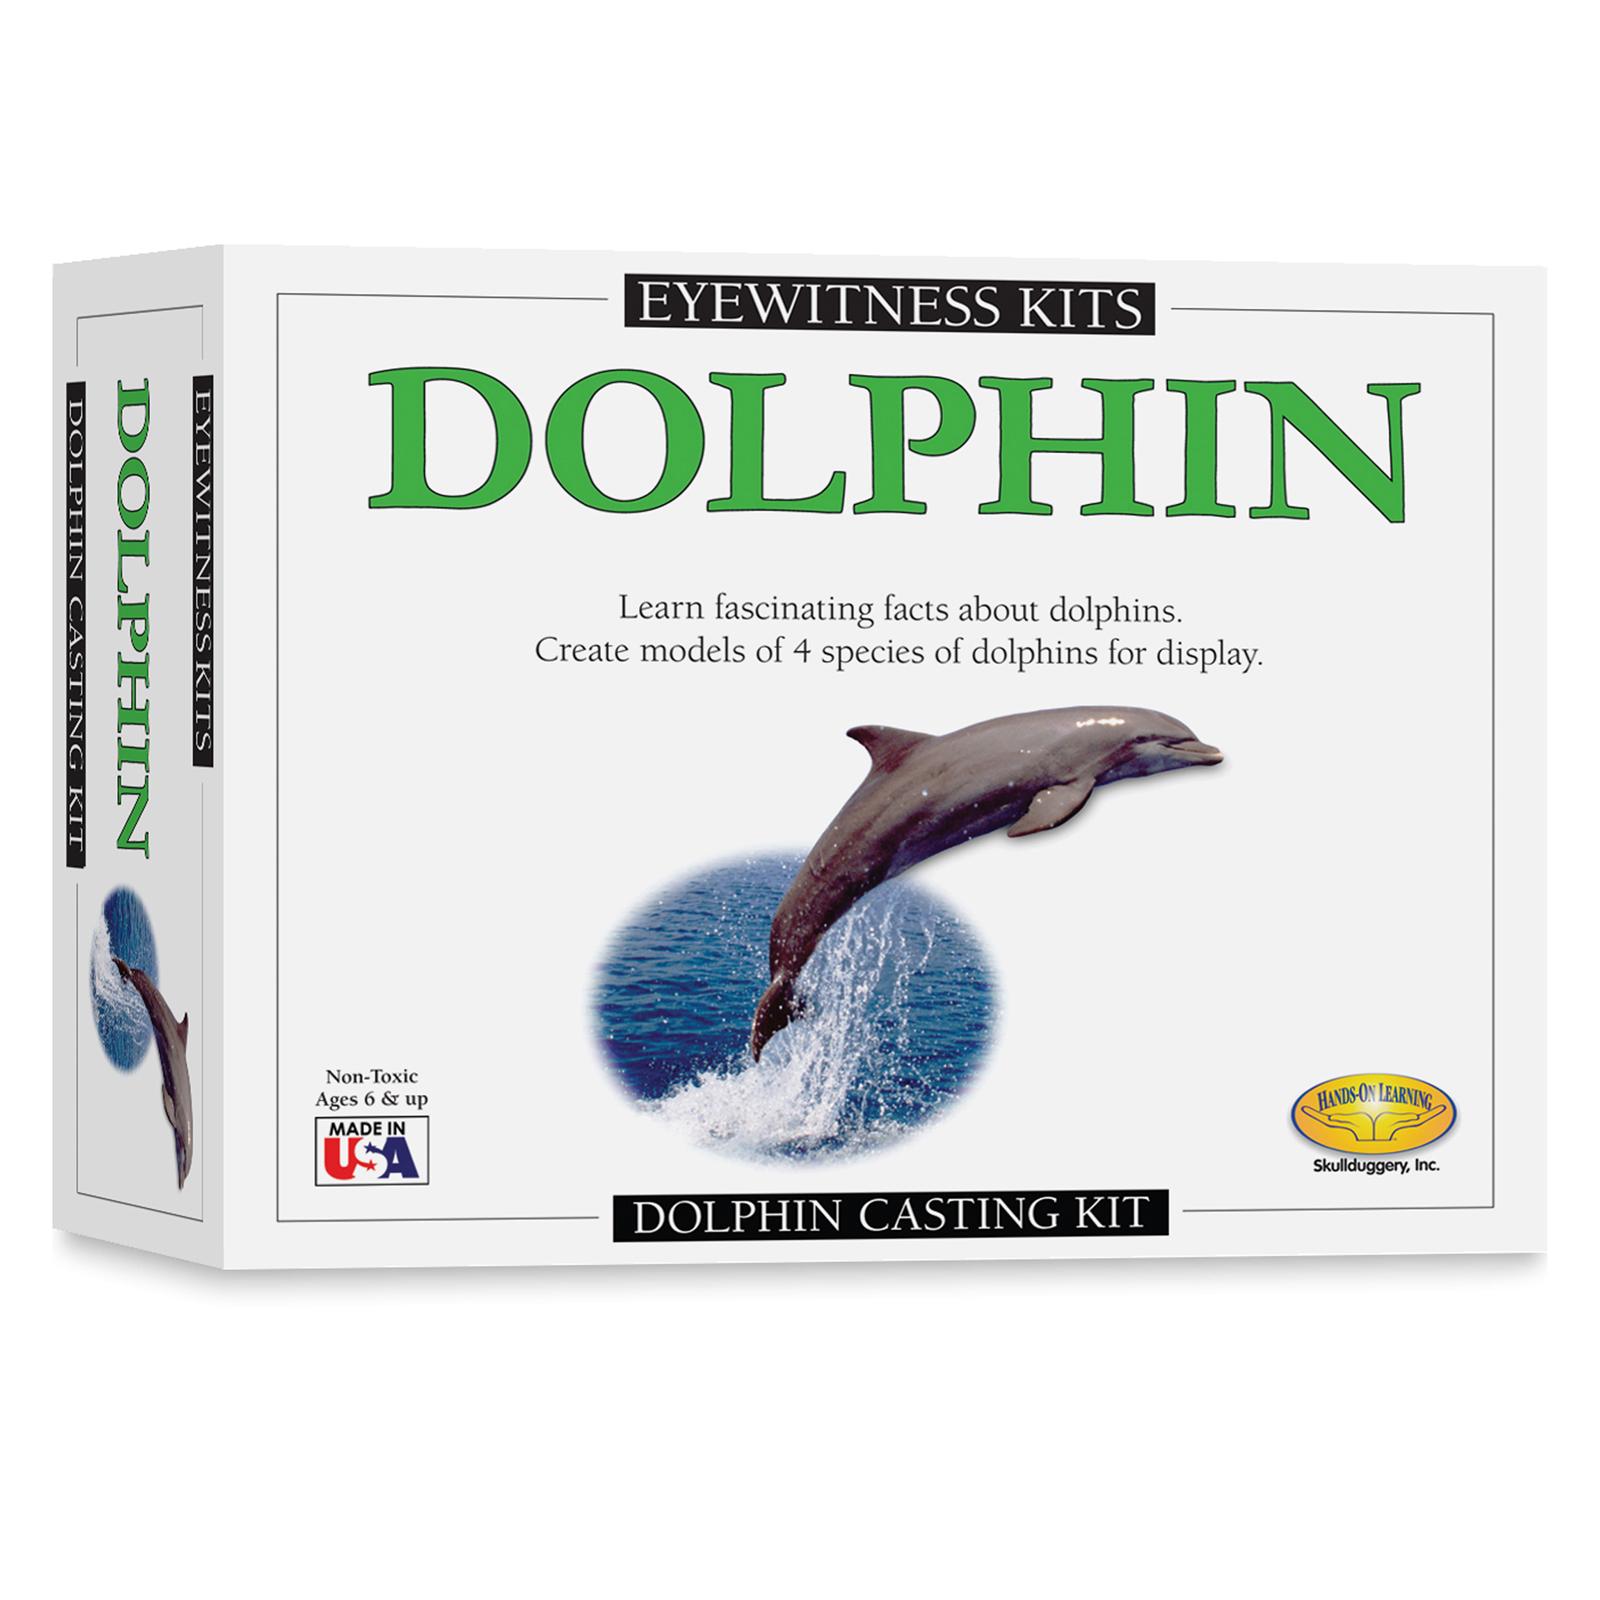 Skullduggery Eyewitness Dolphin Casting Kit 004V007578598000